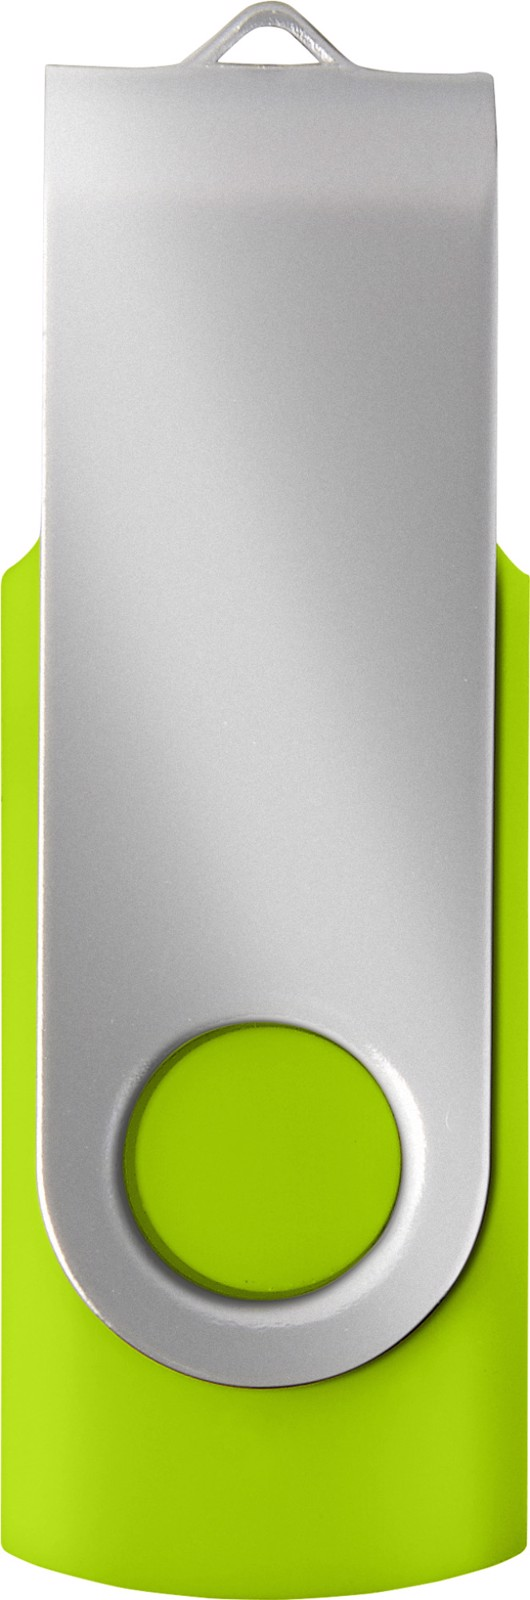 ABS USB drive (16GB/32GB) - Green / Silver